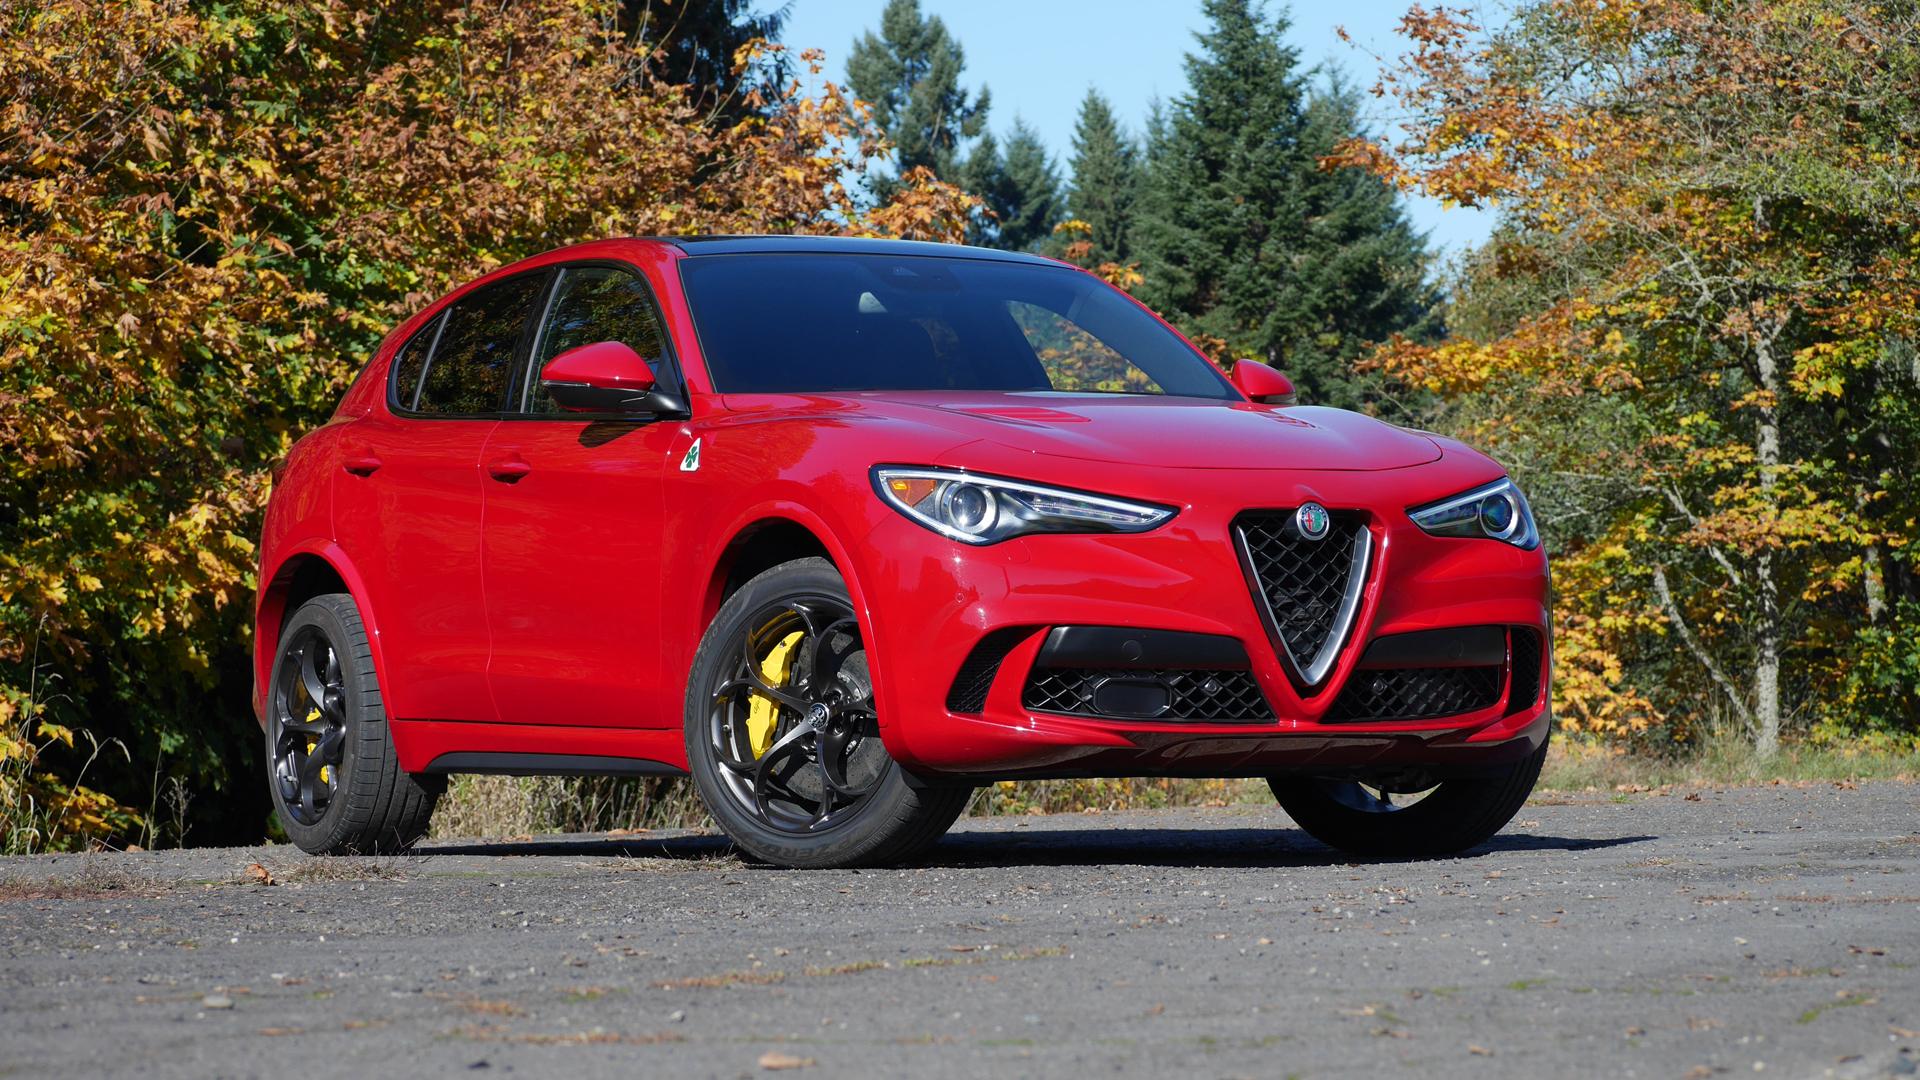 2019 Alfa Romeo Stelvio Quadrifoglio Review Performance Interior Handling Autoblog